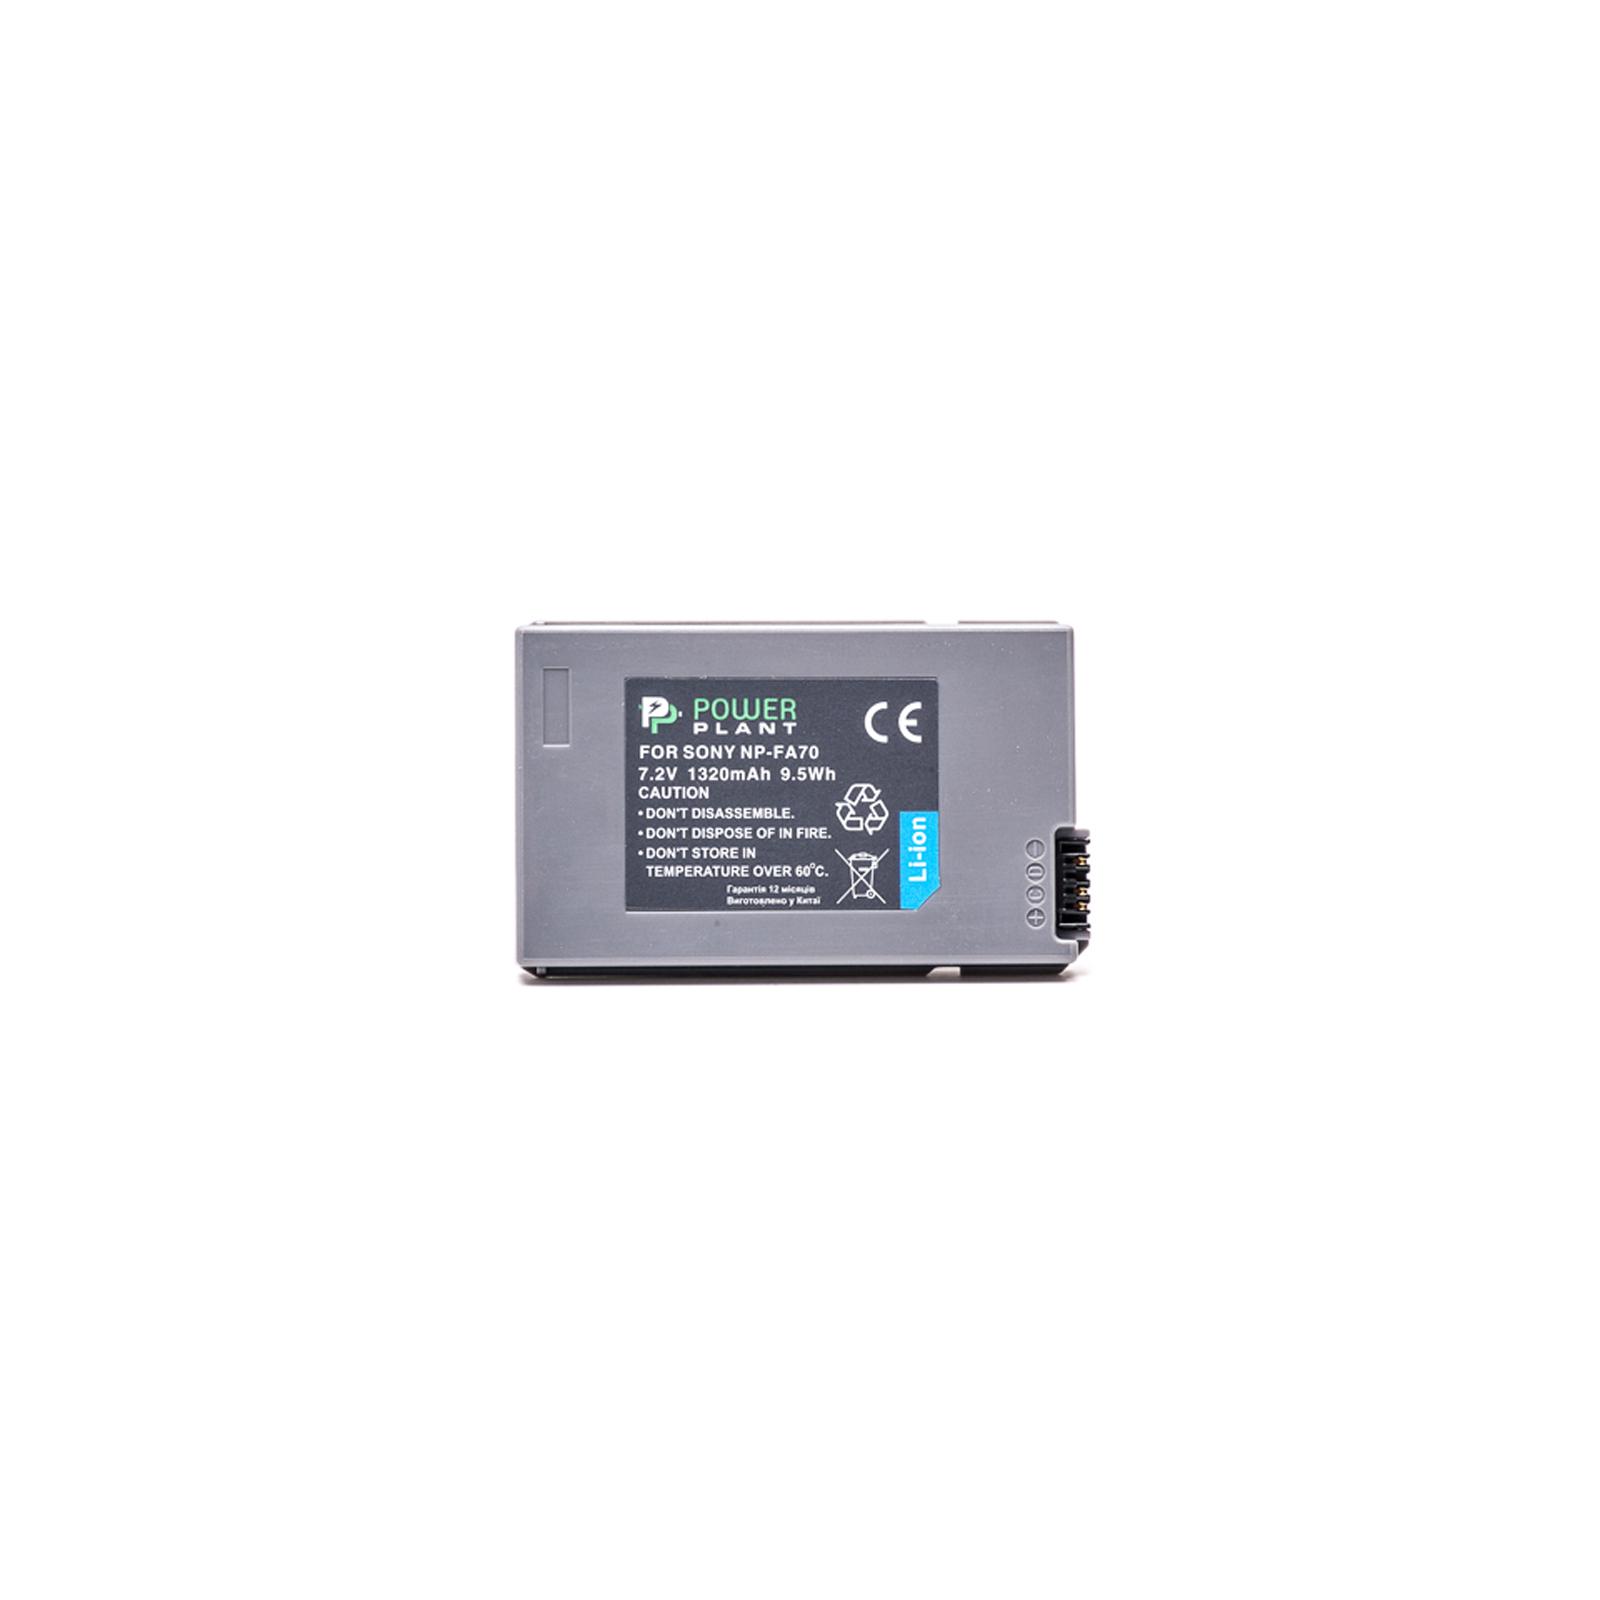 Аккумулятор к фото/видео PowerPlant Sony NP-FA70 (DV00DV1065) изображение 2